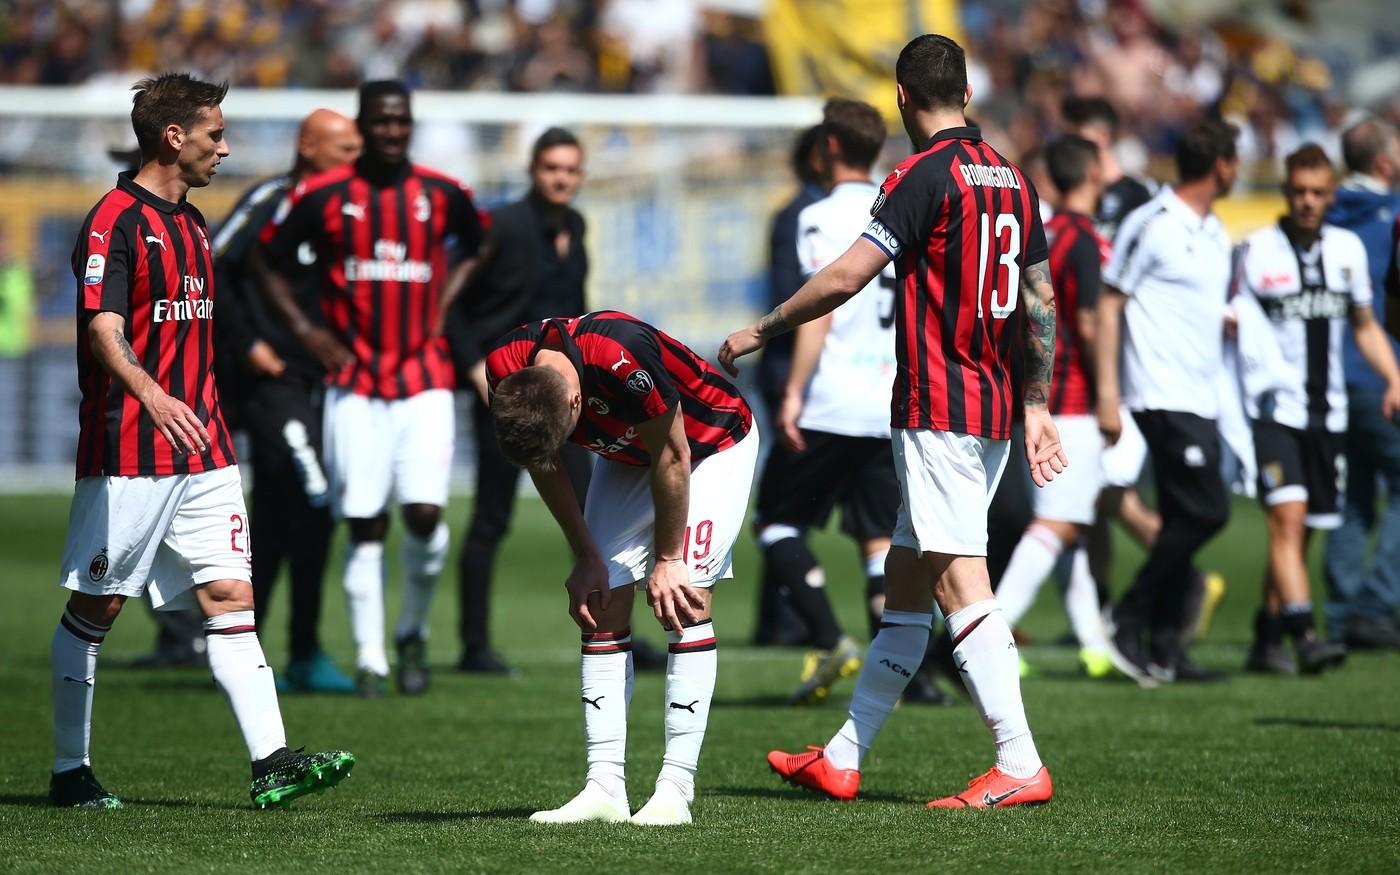 Serie A, Milan frena a Parma: 1-1, Bruno Alves complica i piani per la Champions